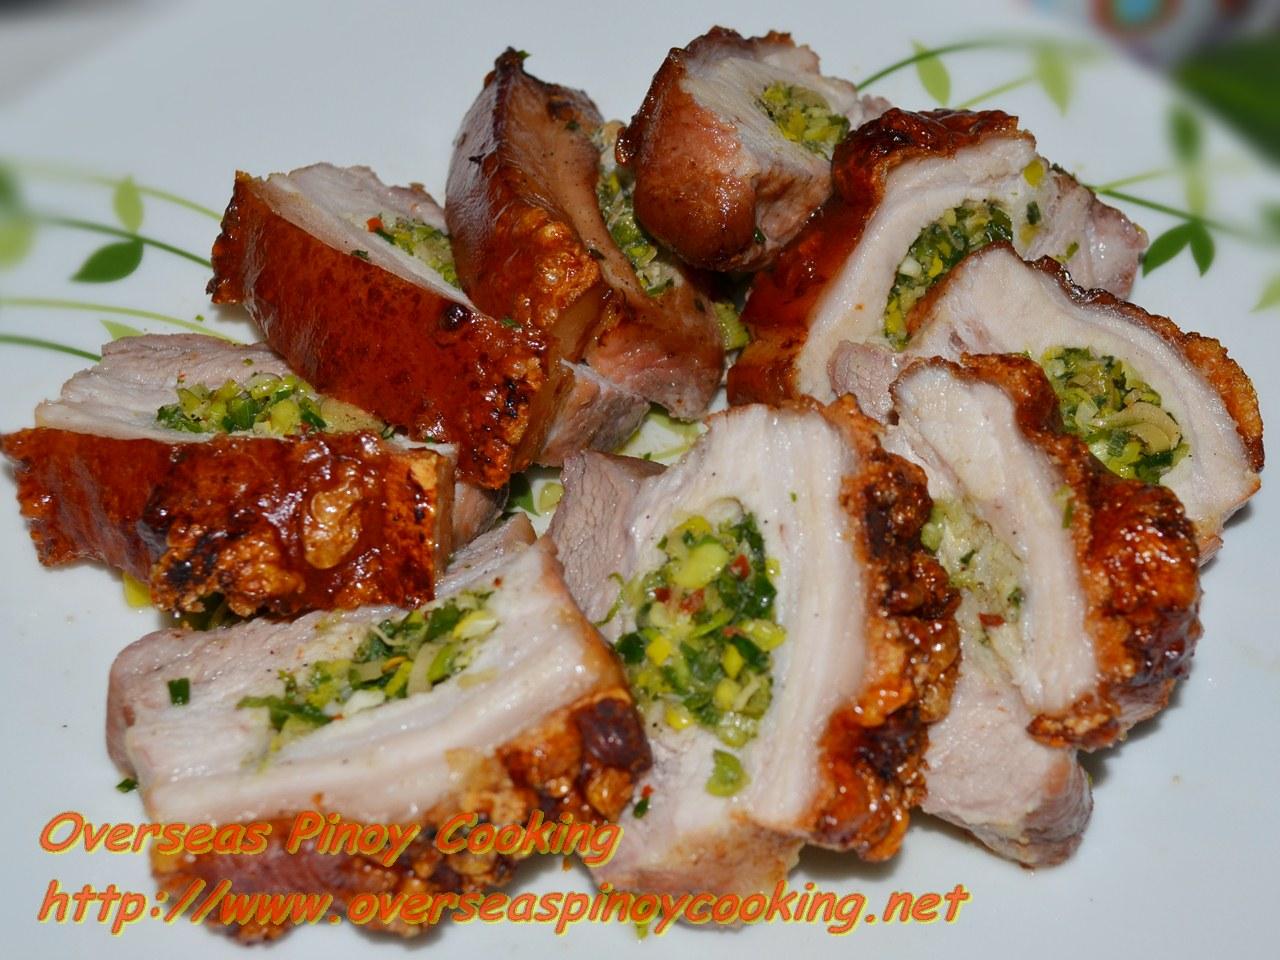 Roast Pork Belly, Balamban Liempo Style